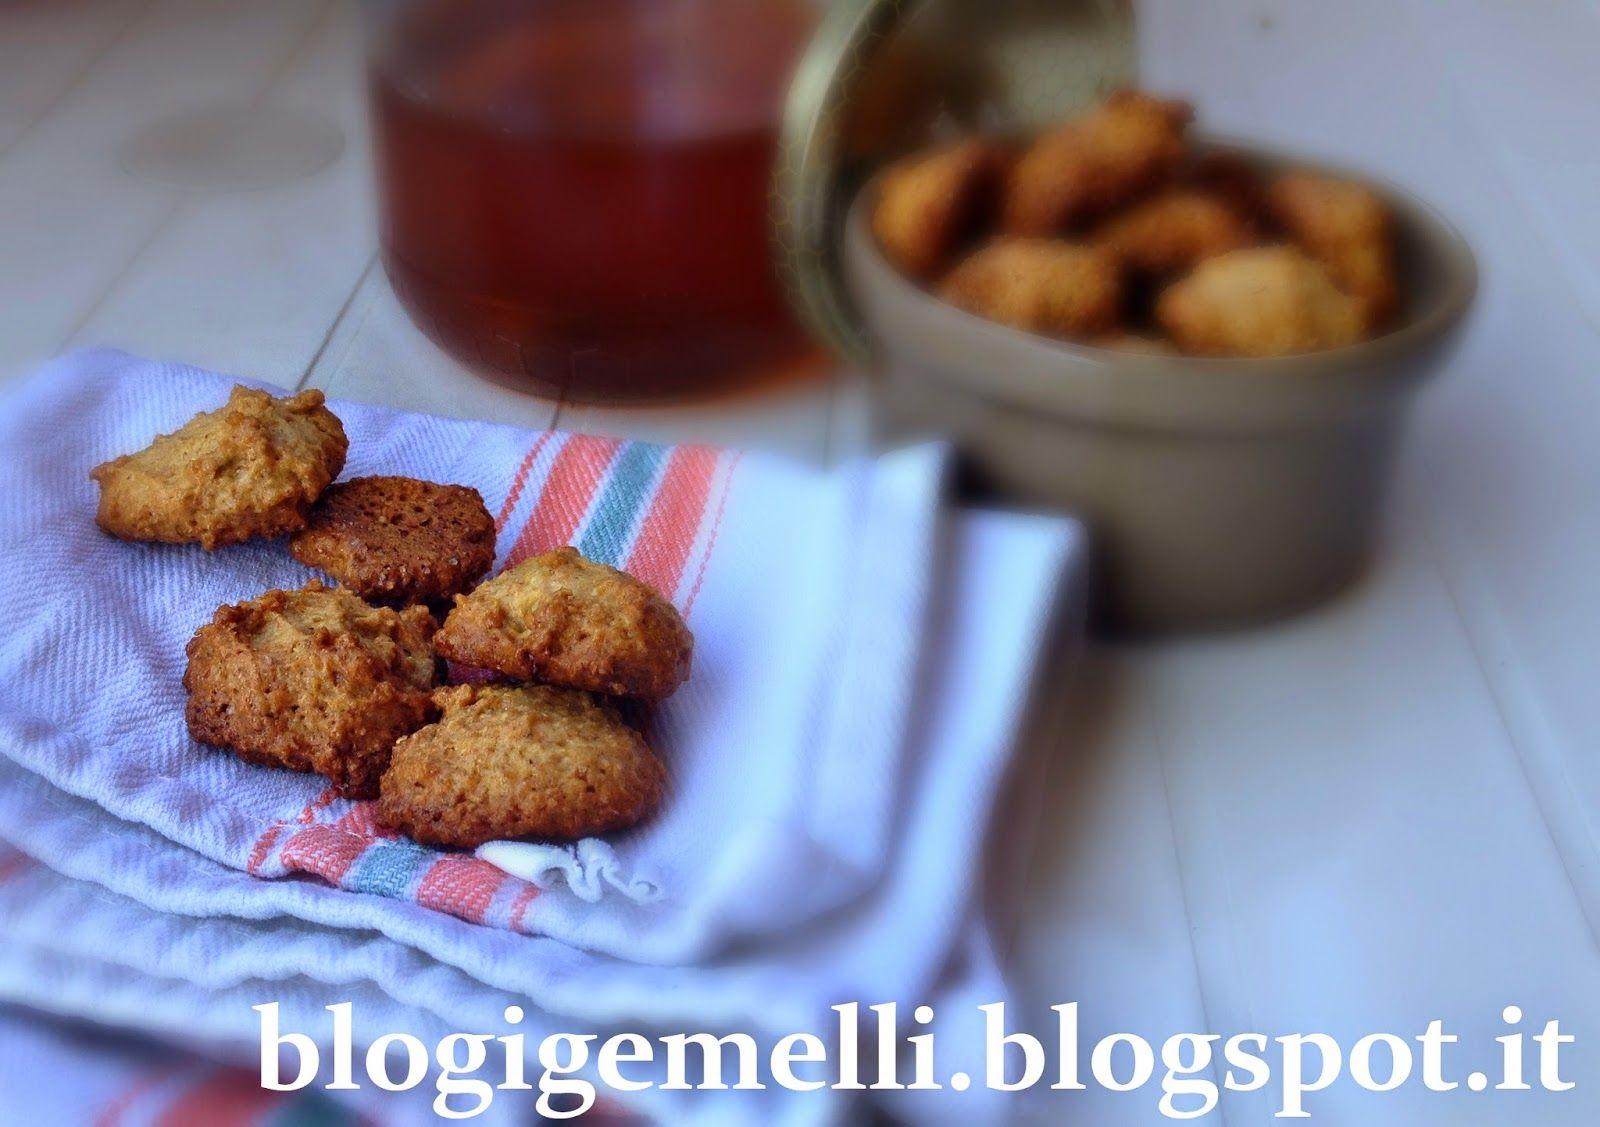 Biscotti integrali al miele http://blogigemelli.blogspot.it/2014/09/biscotti-integrali-al-miele.html#more